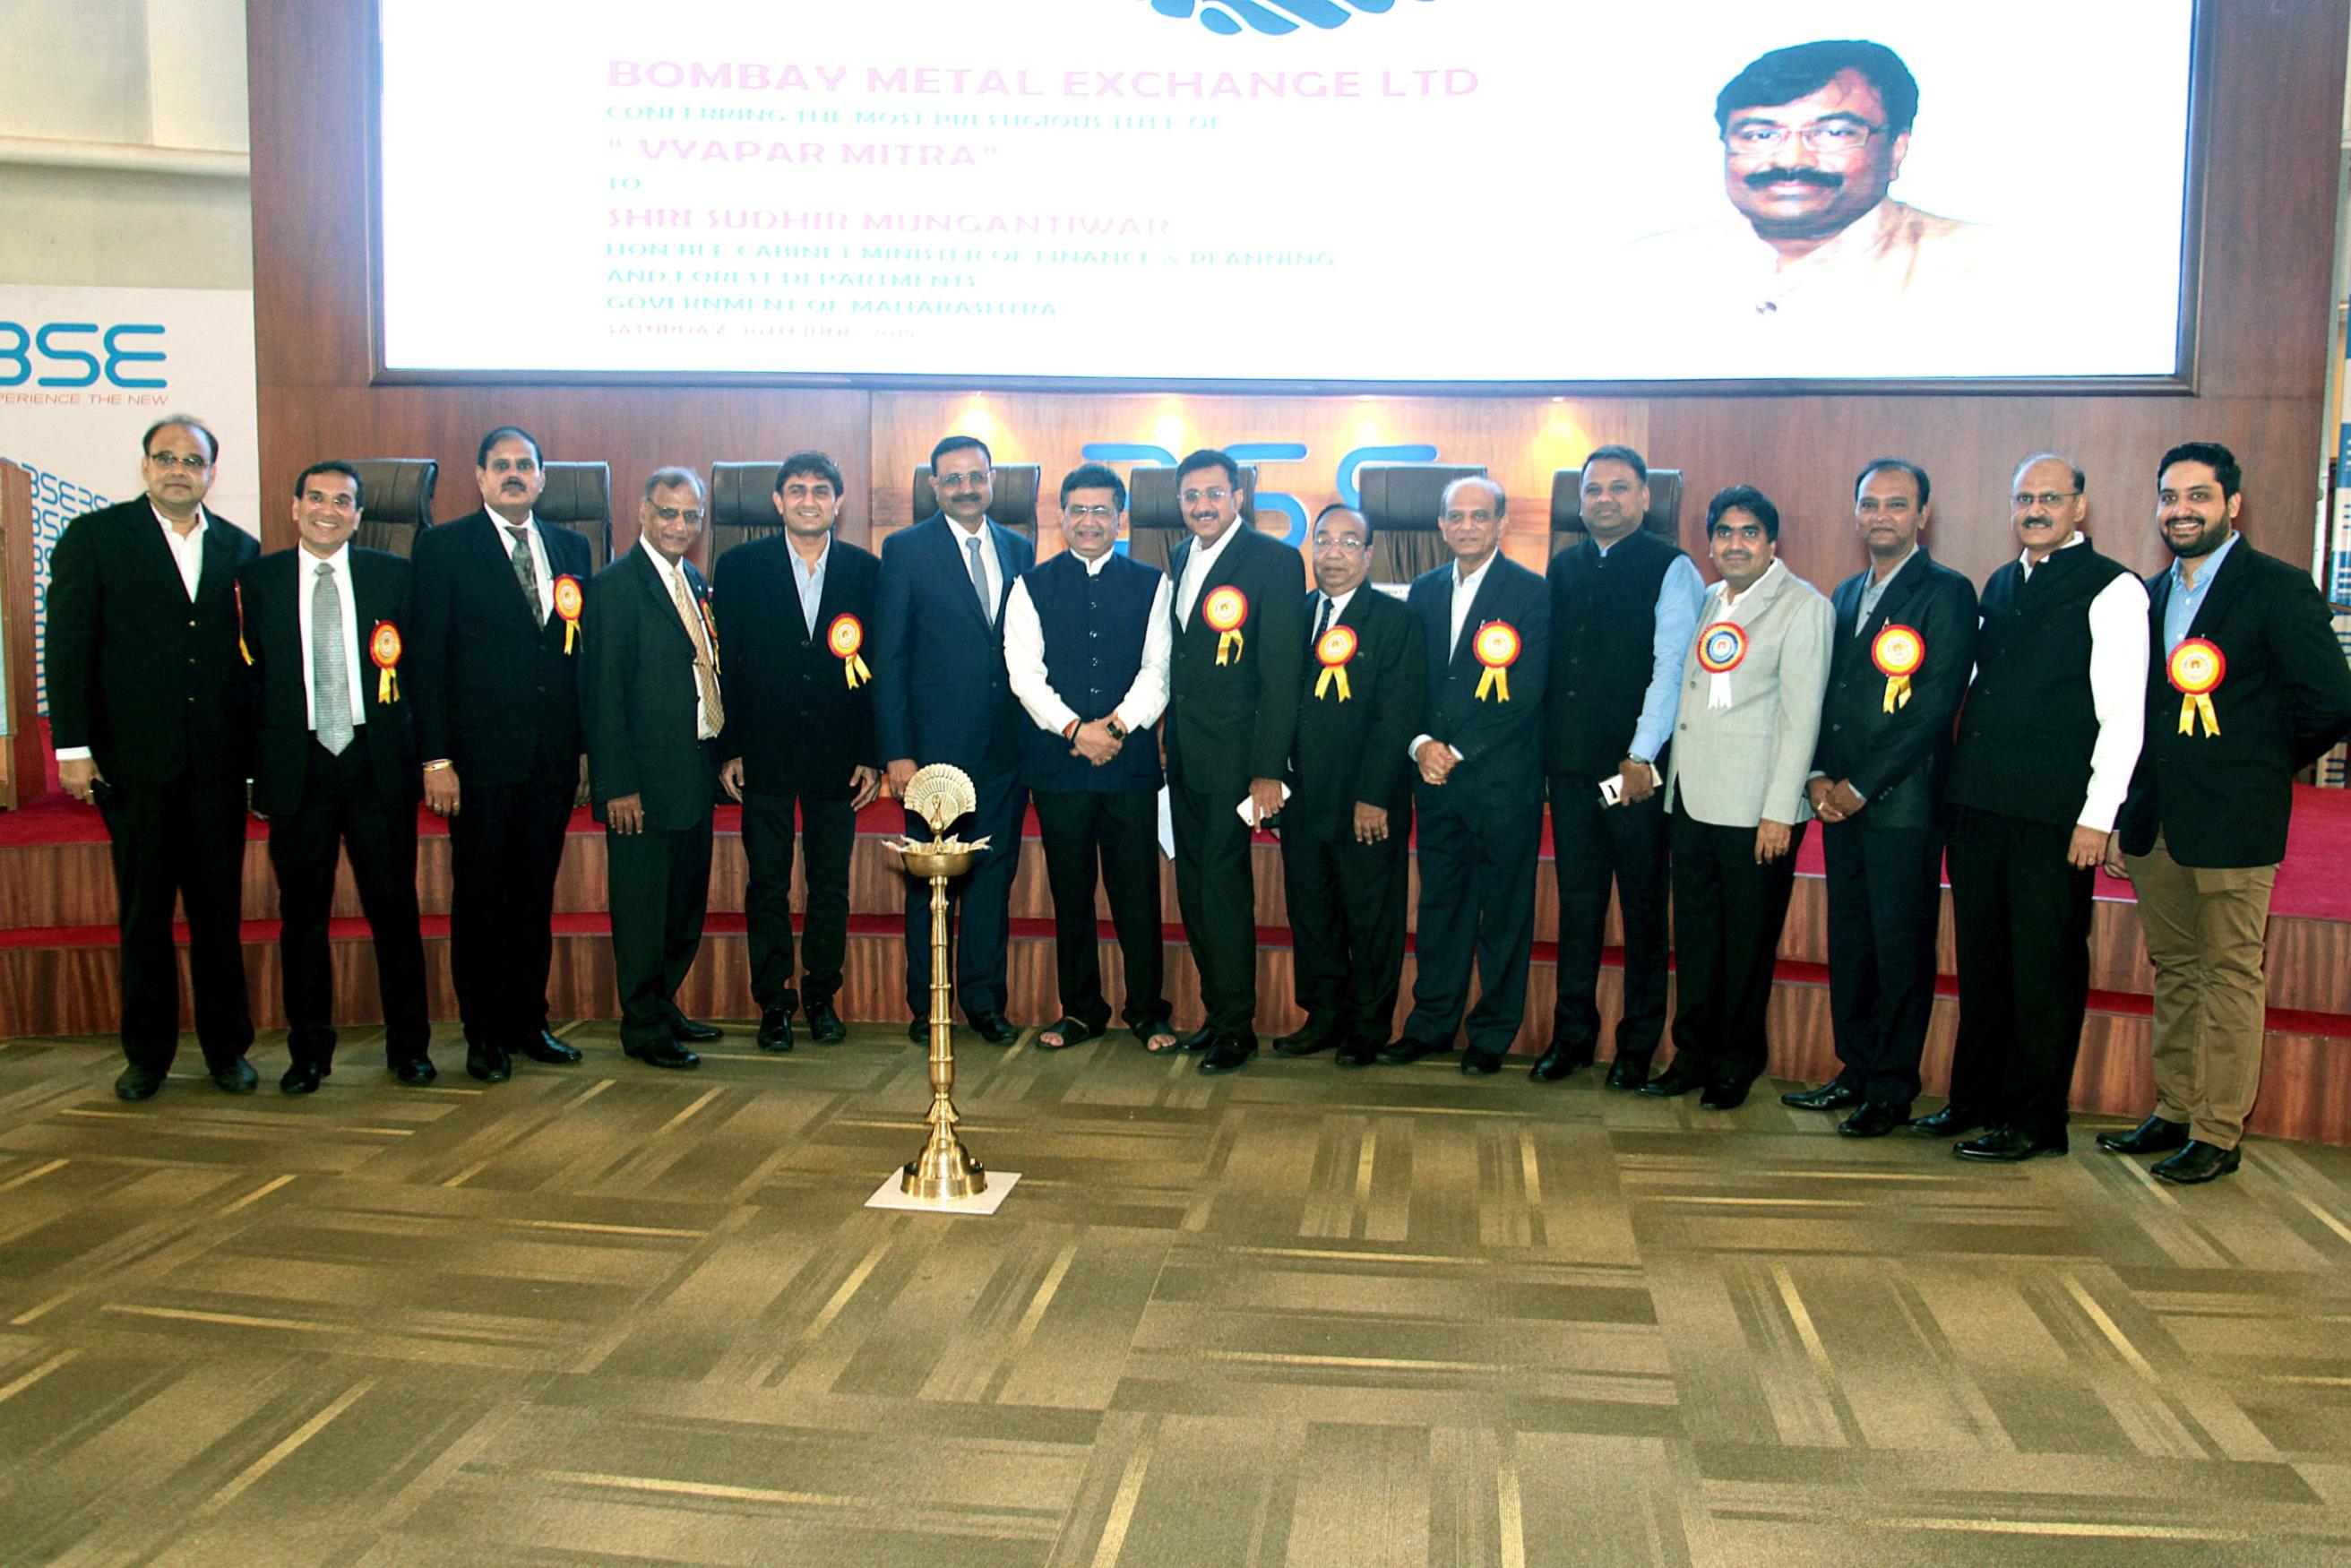 BME BSE MOU Event & Conferring of Vyapr Mitra to Shri Sudhir Mungantiwar Honble FM